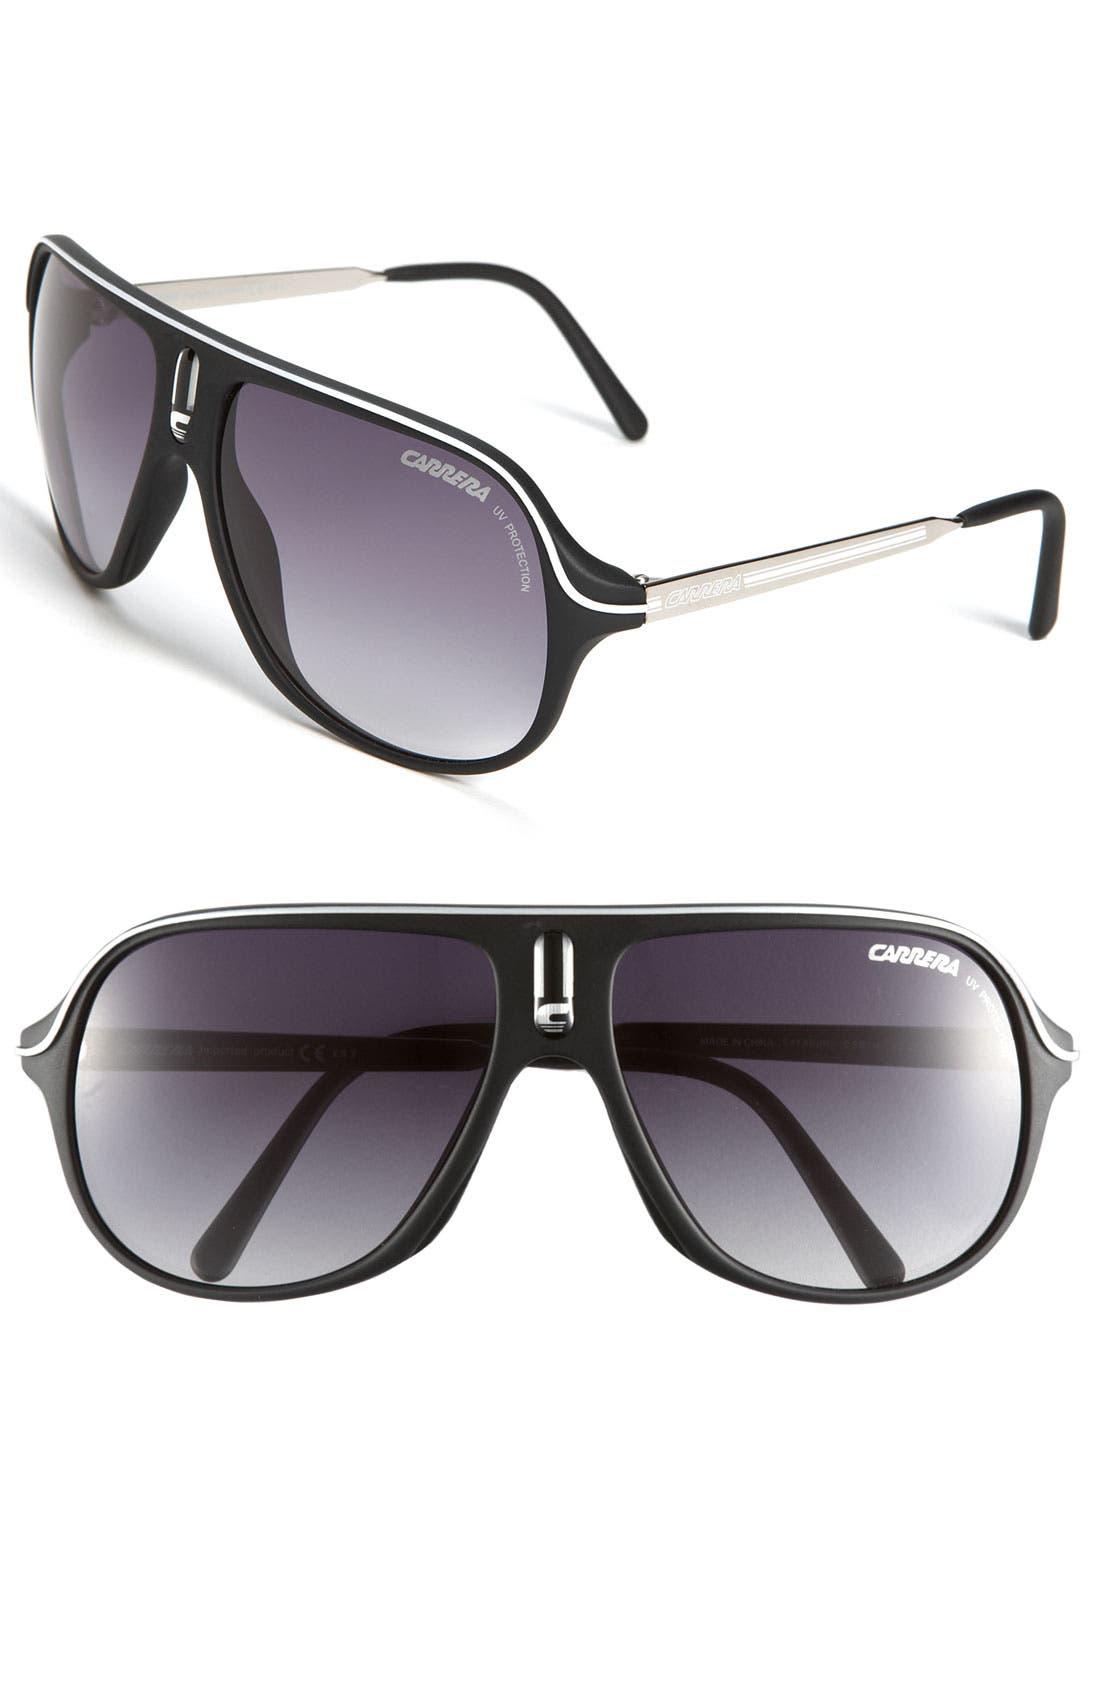 Alternate Image 1 Selected - Carrera Eyewear 'Safarrs' 62mm Aviator Sunglasses